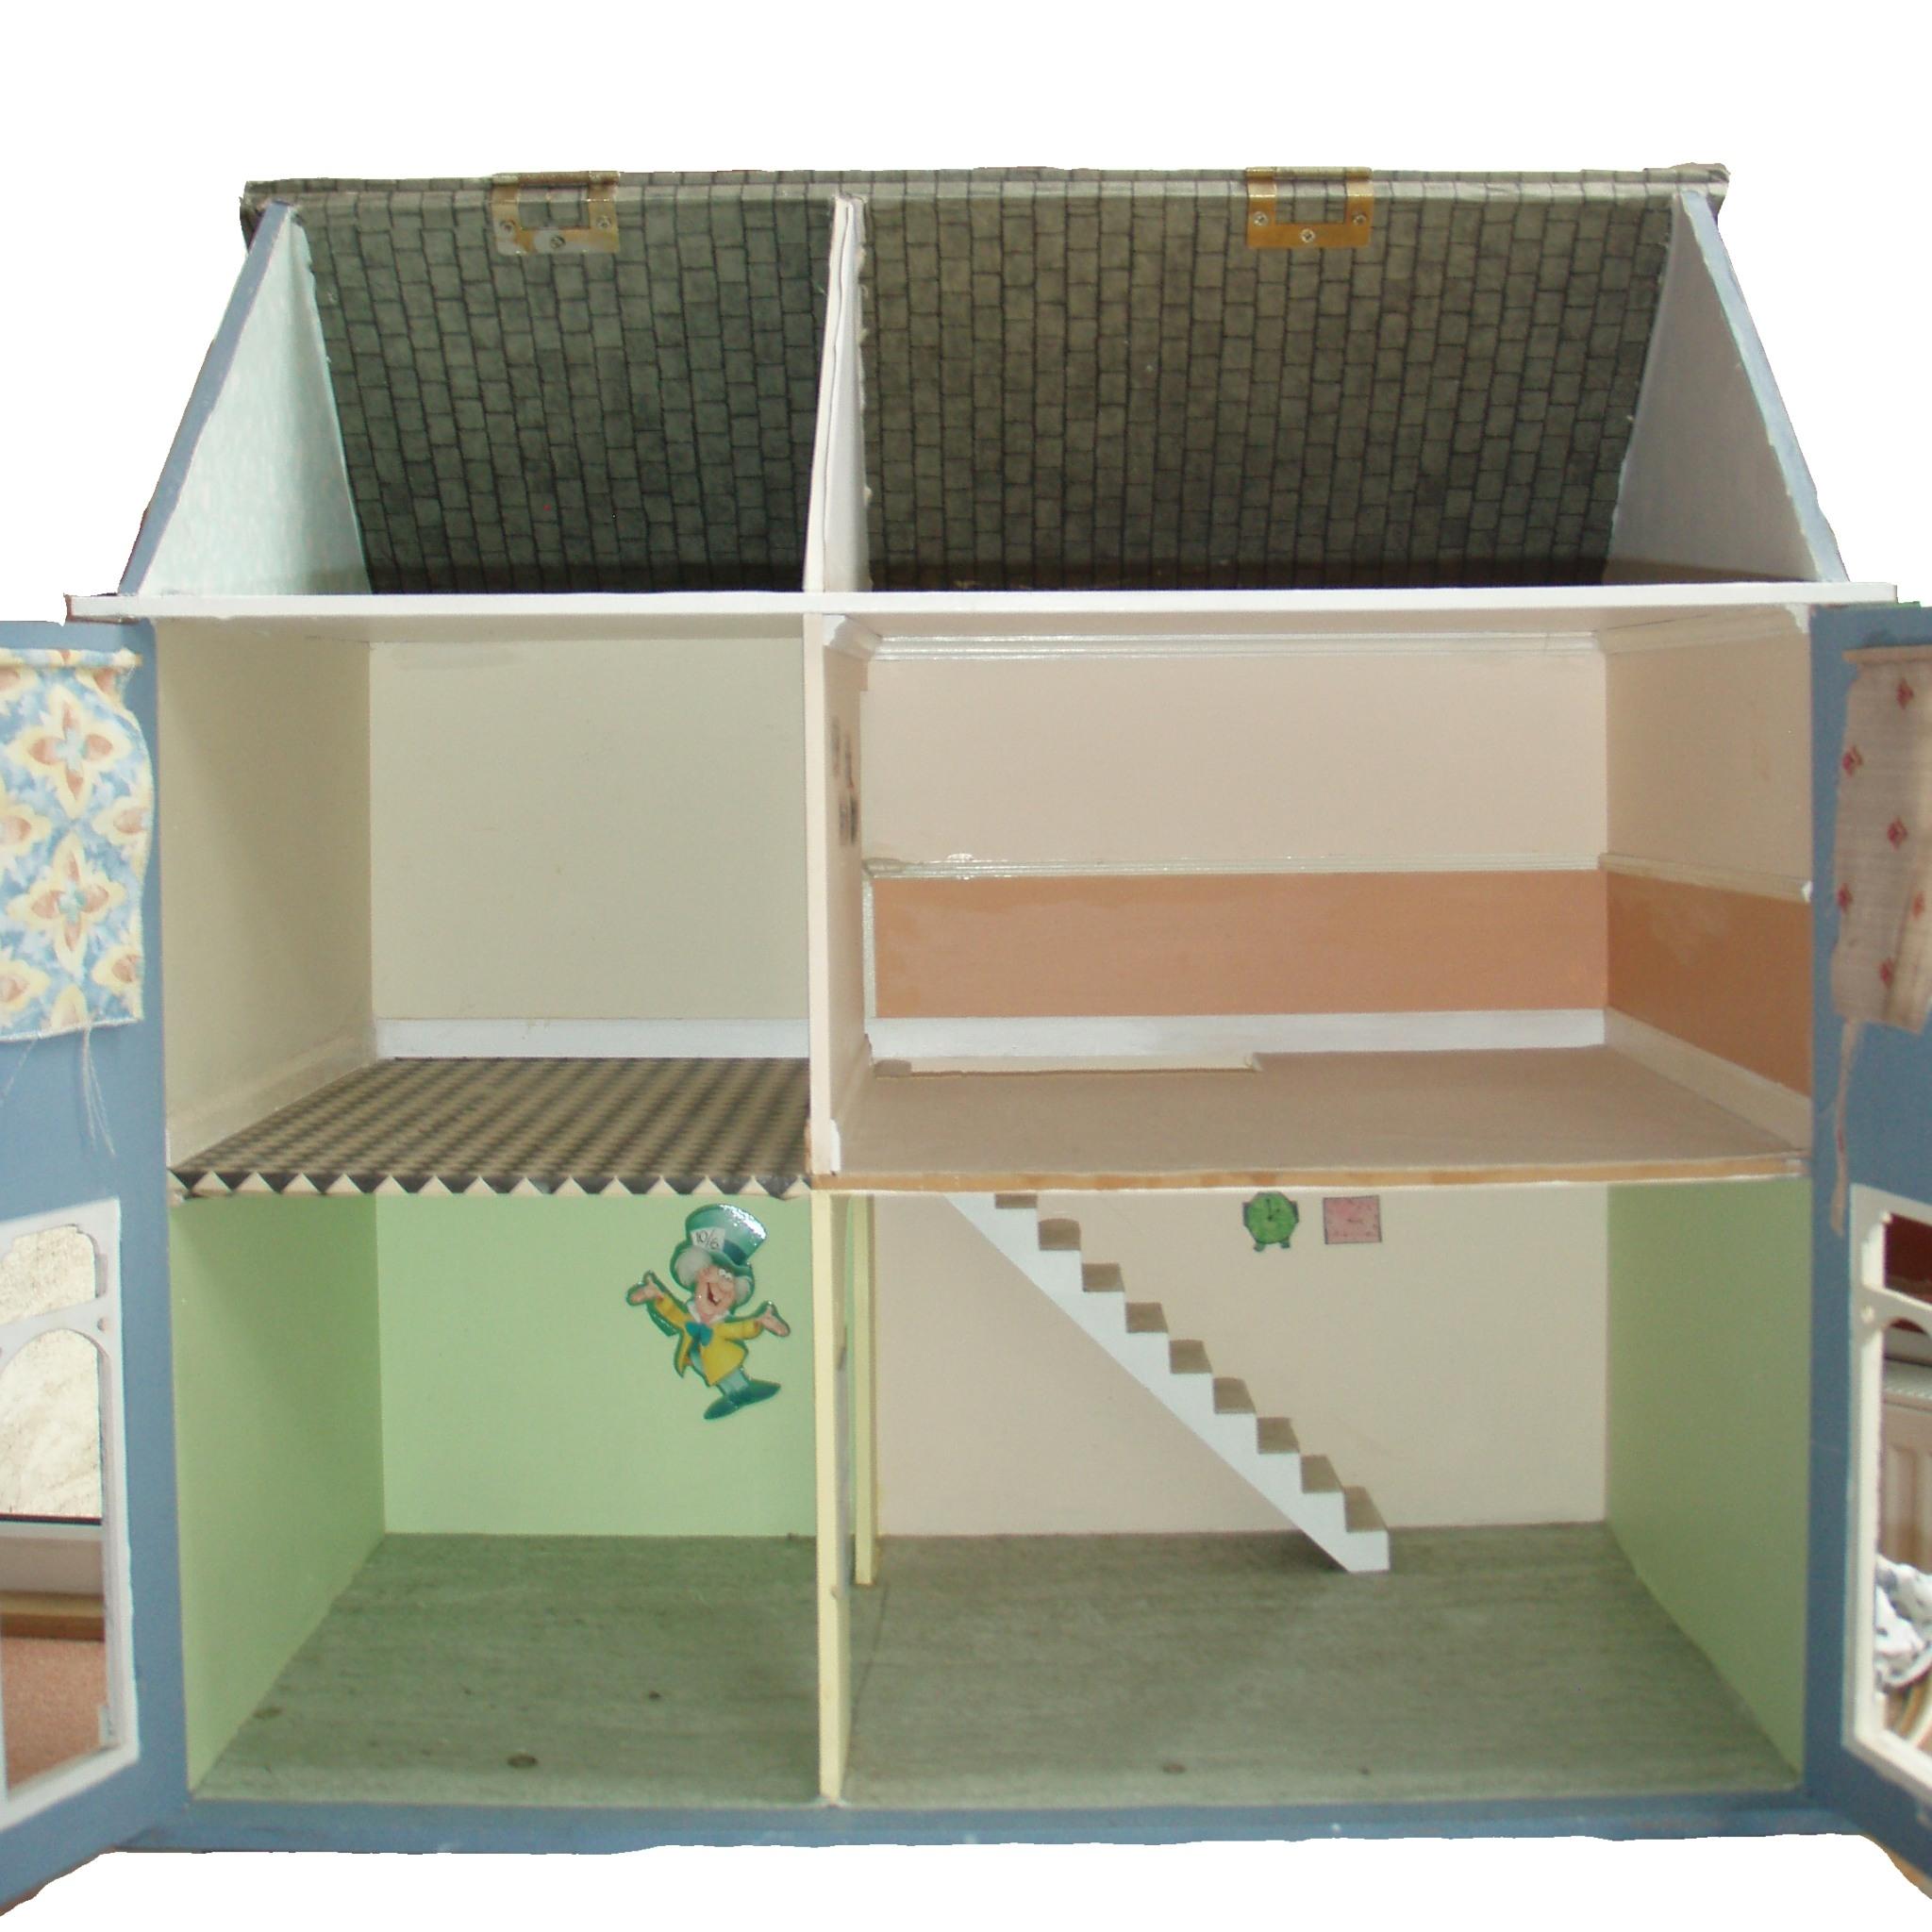 původní stav - interiér 2